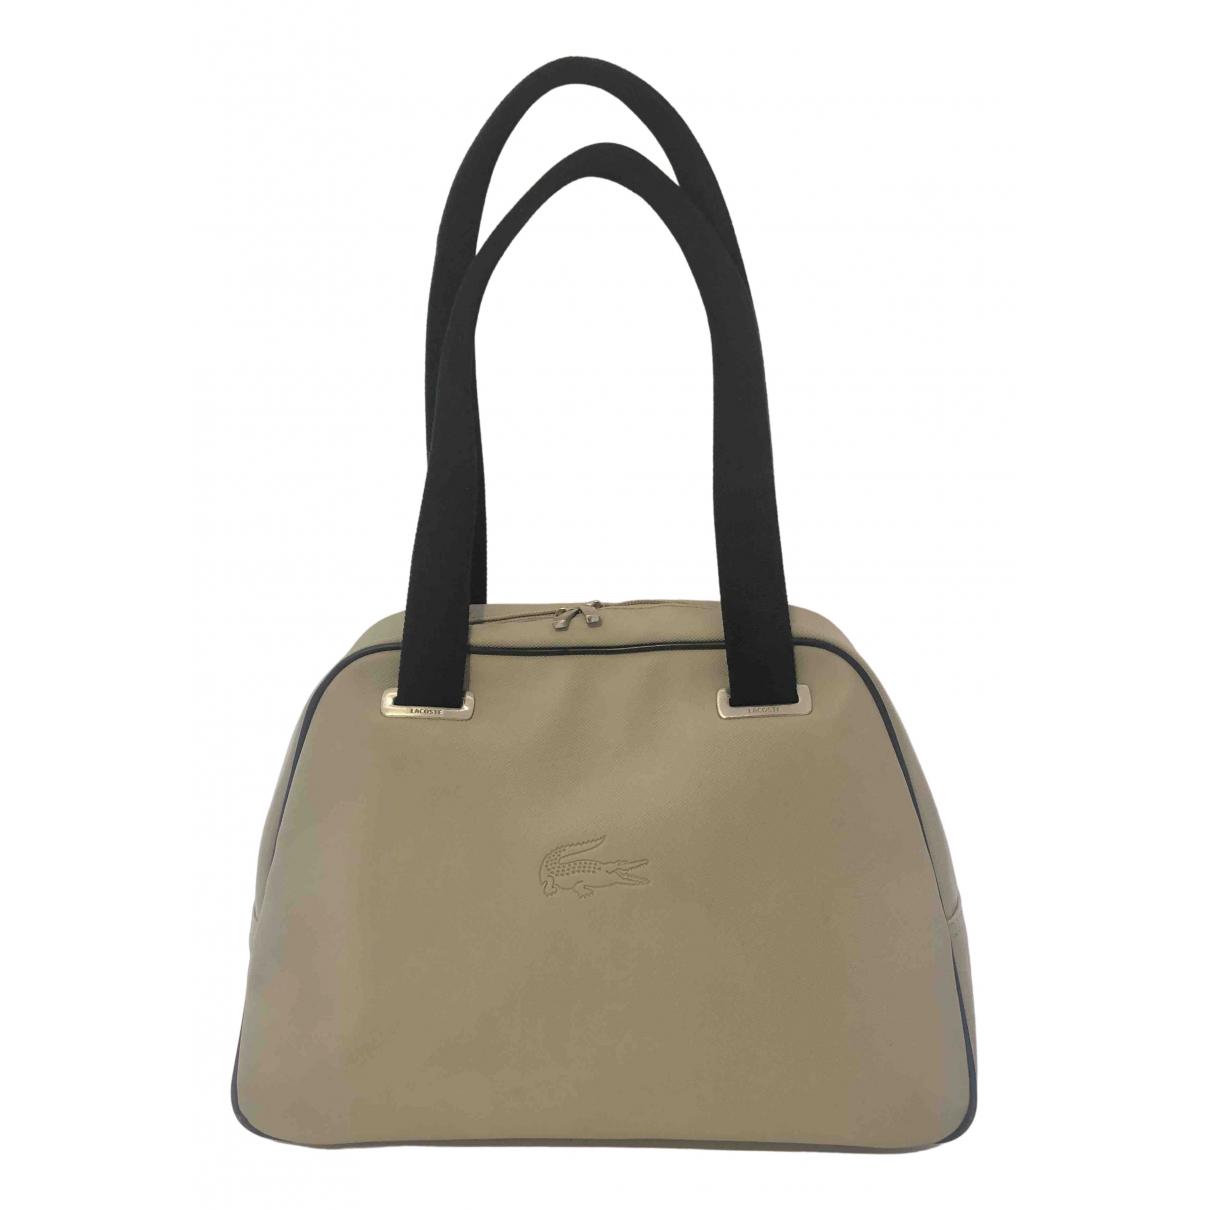 Lacoste N Grey handbag for Women N